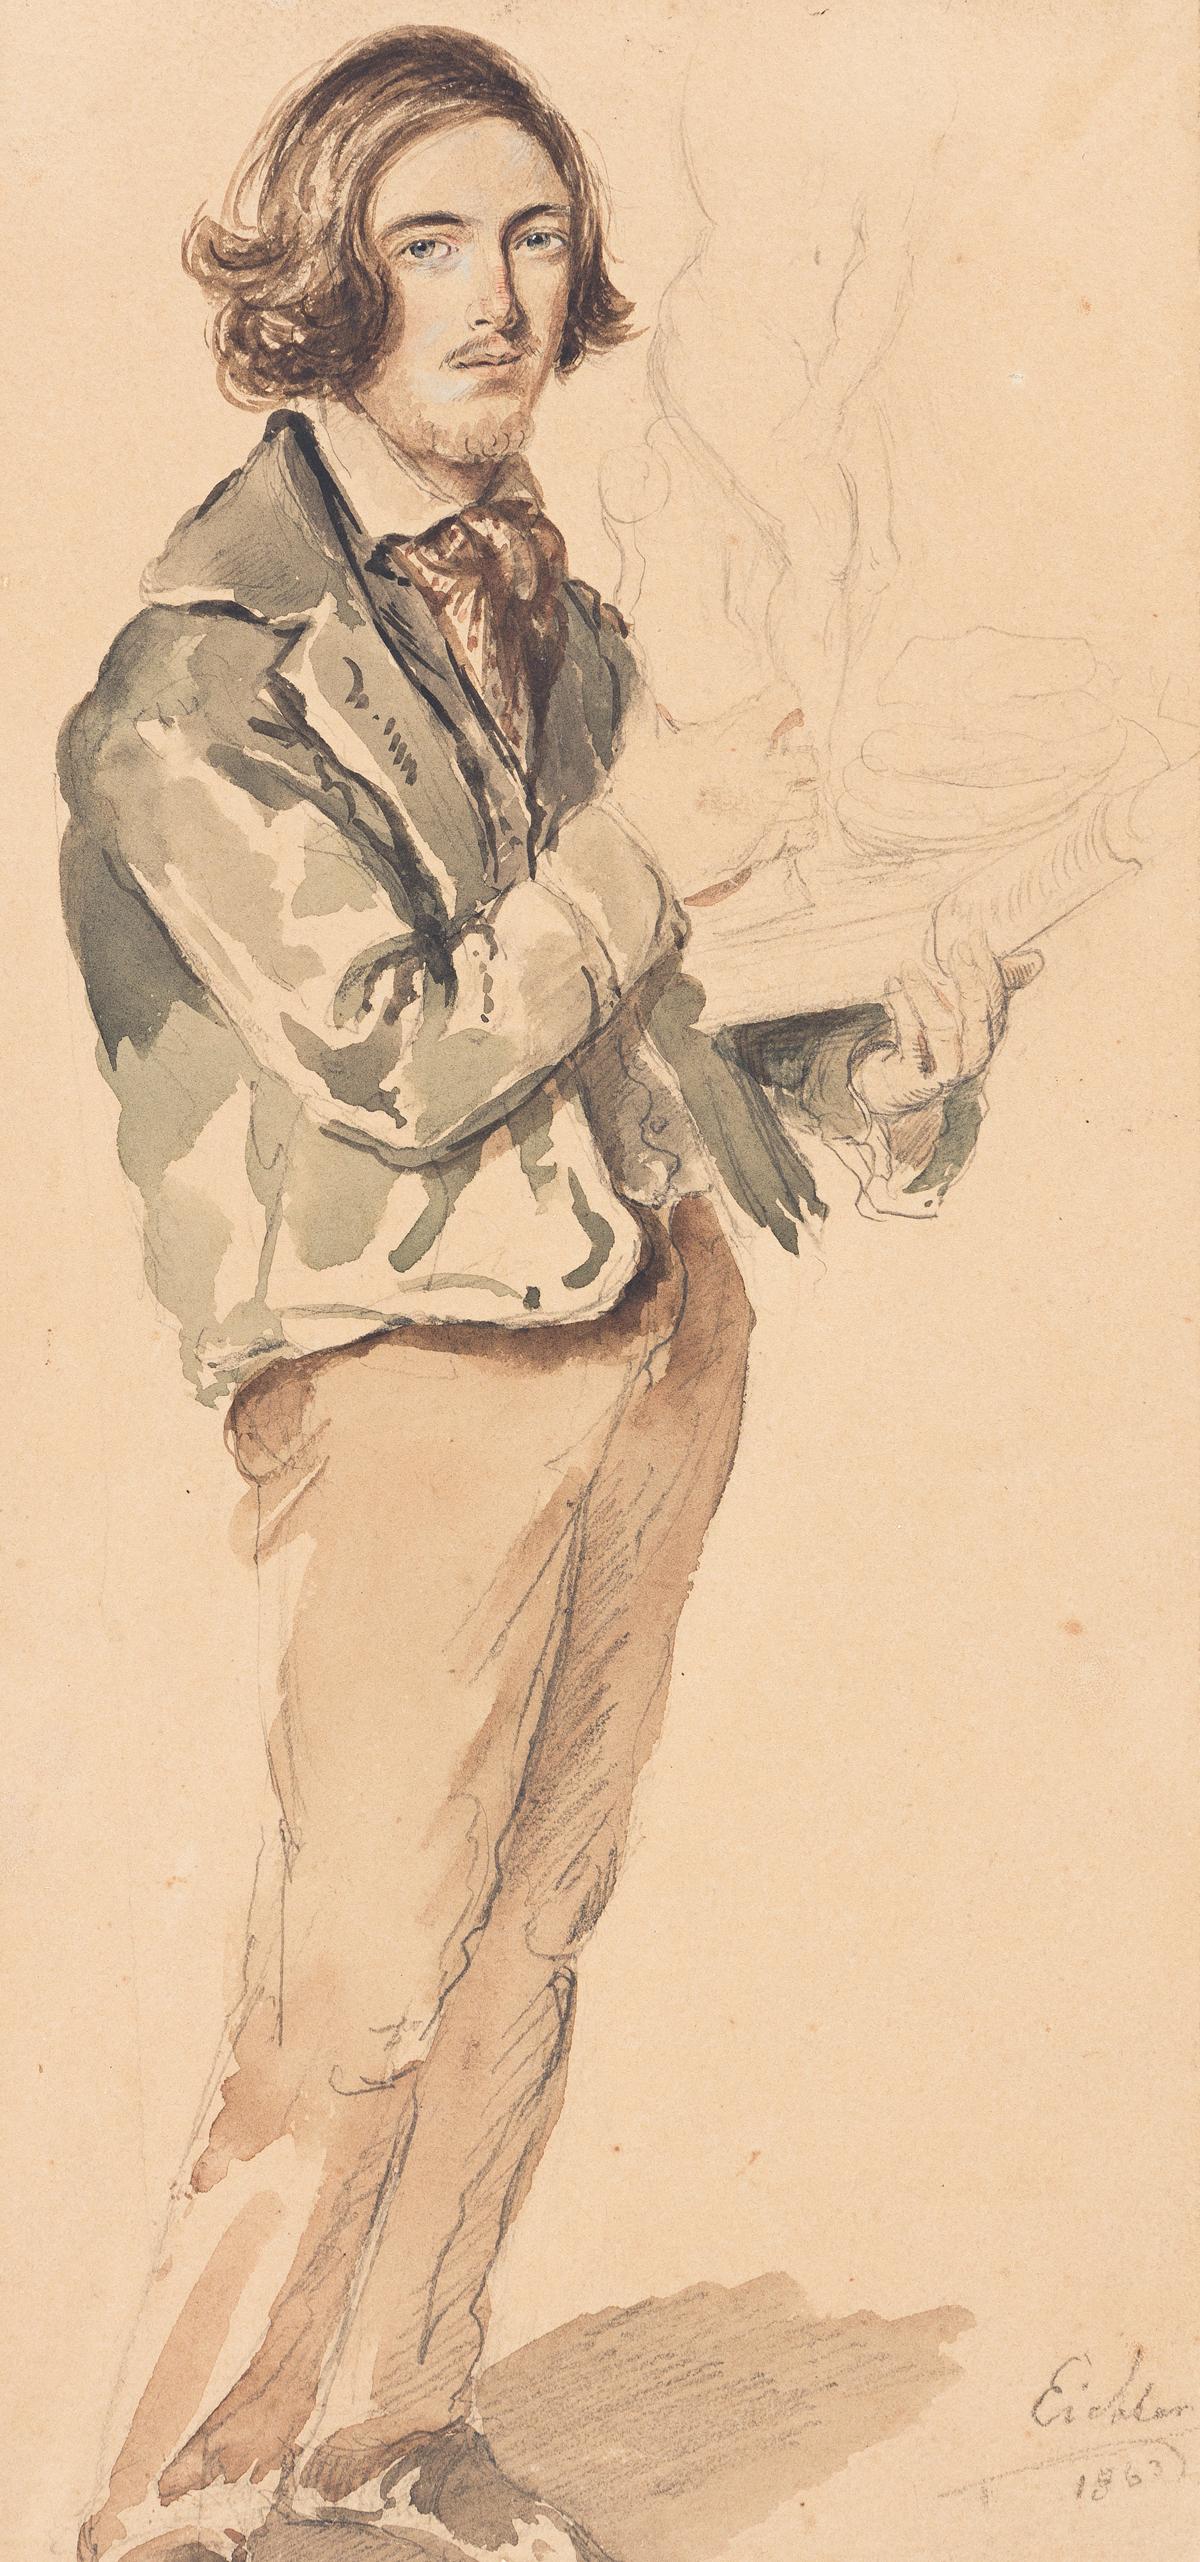 HERMANN EICHLER Full-Length Portrait of an Artist Holding a Sculpture.